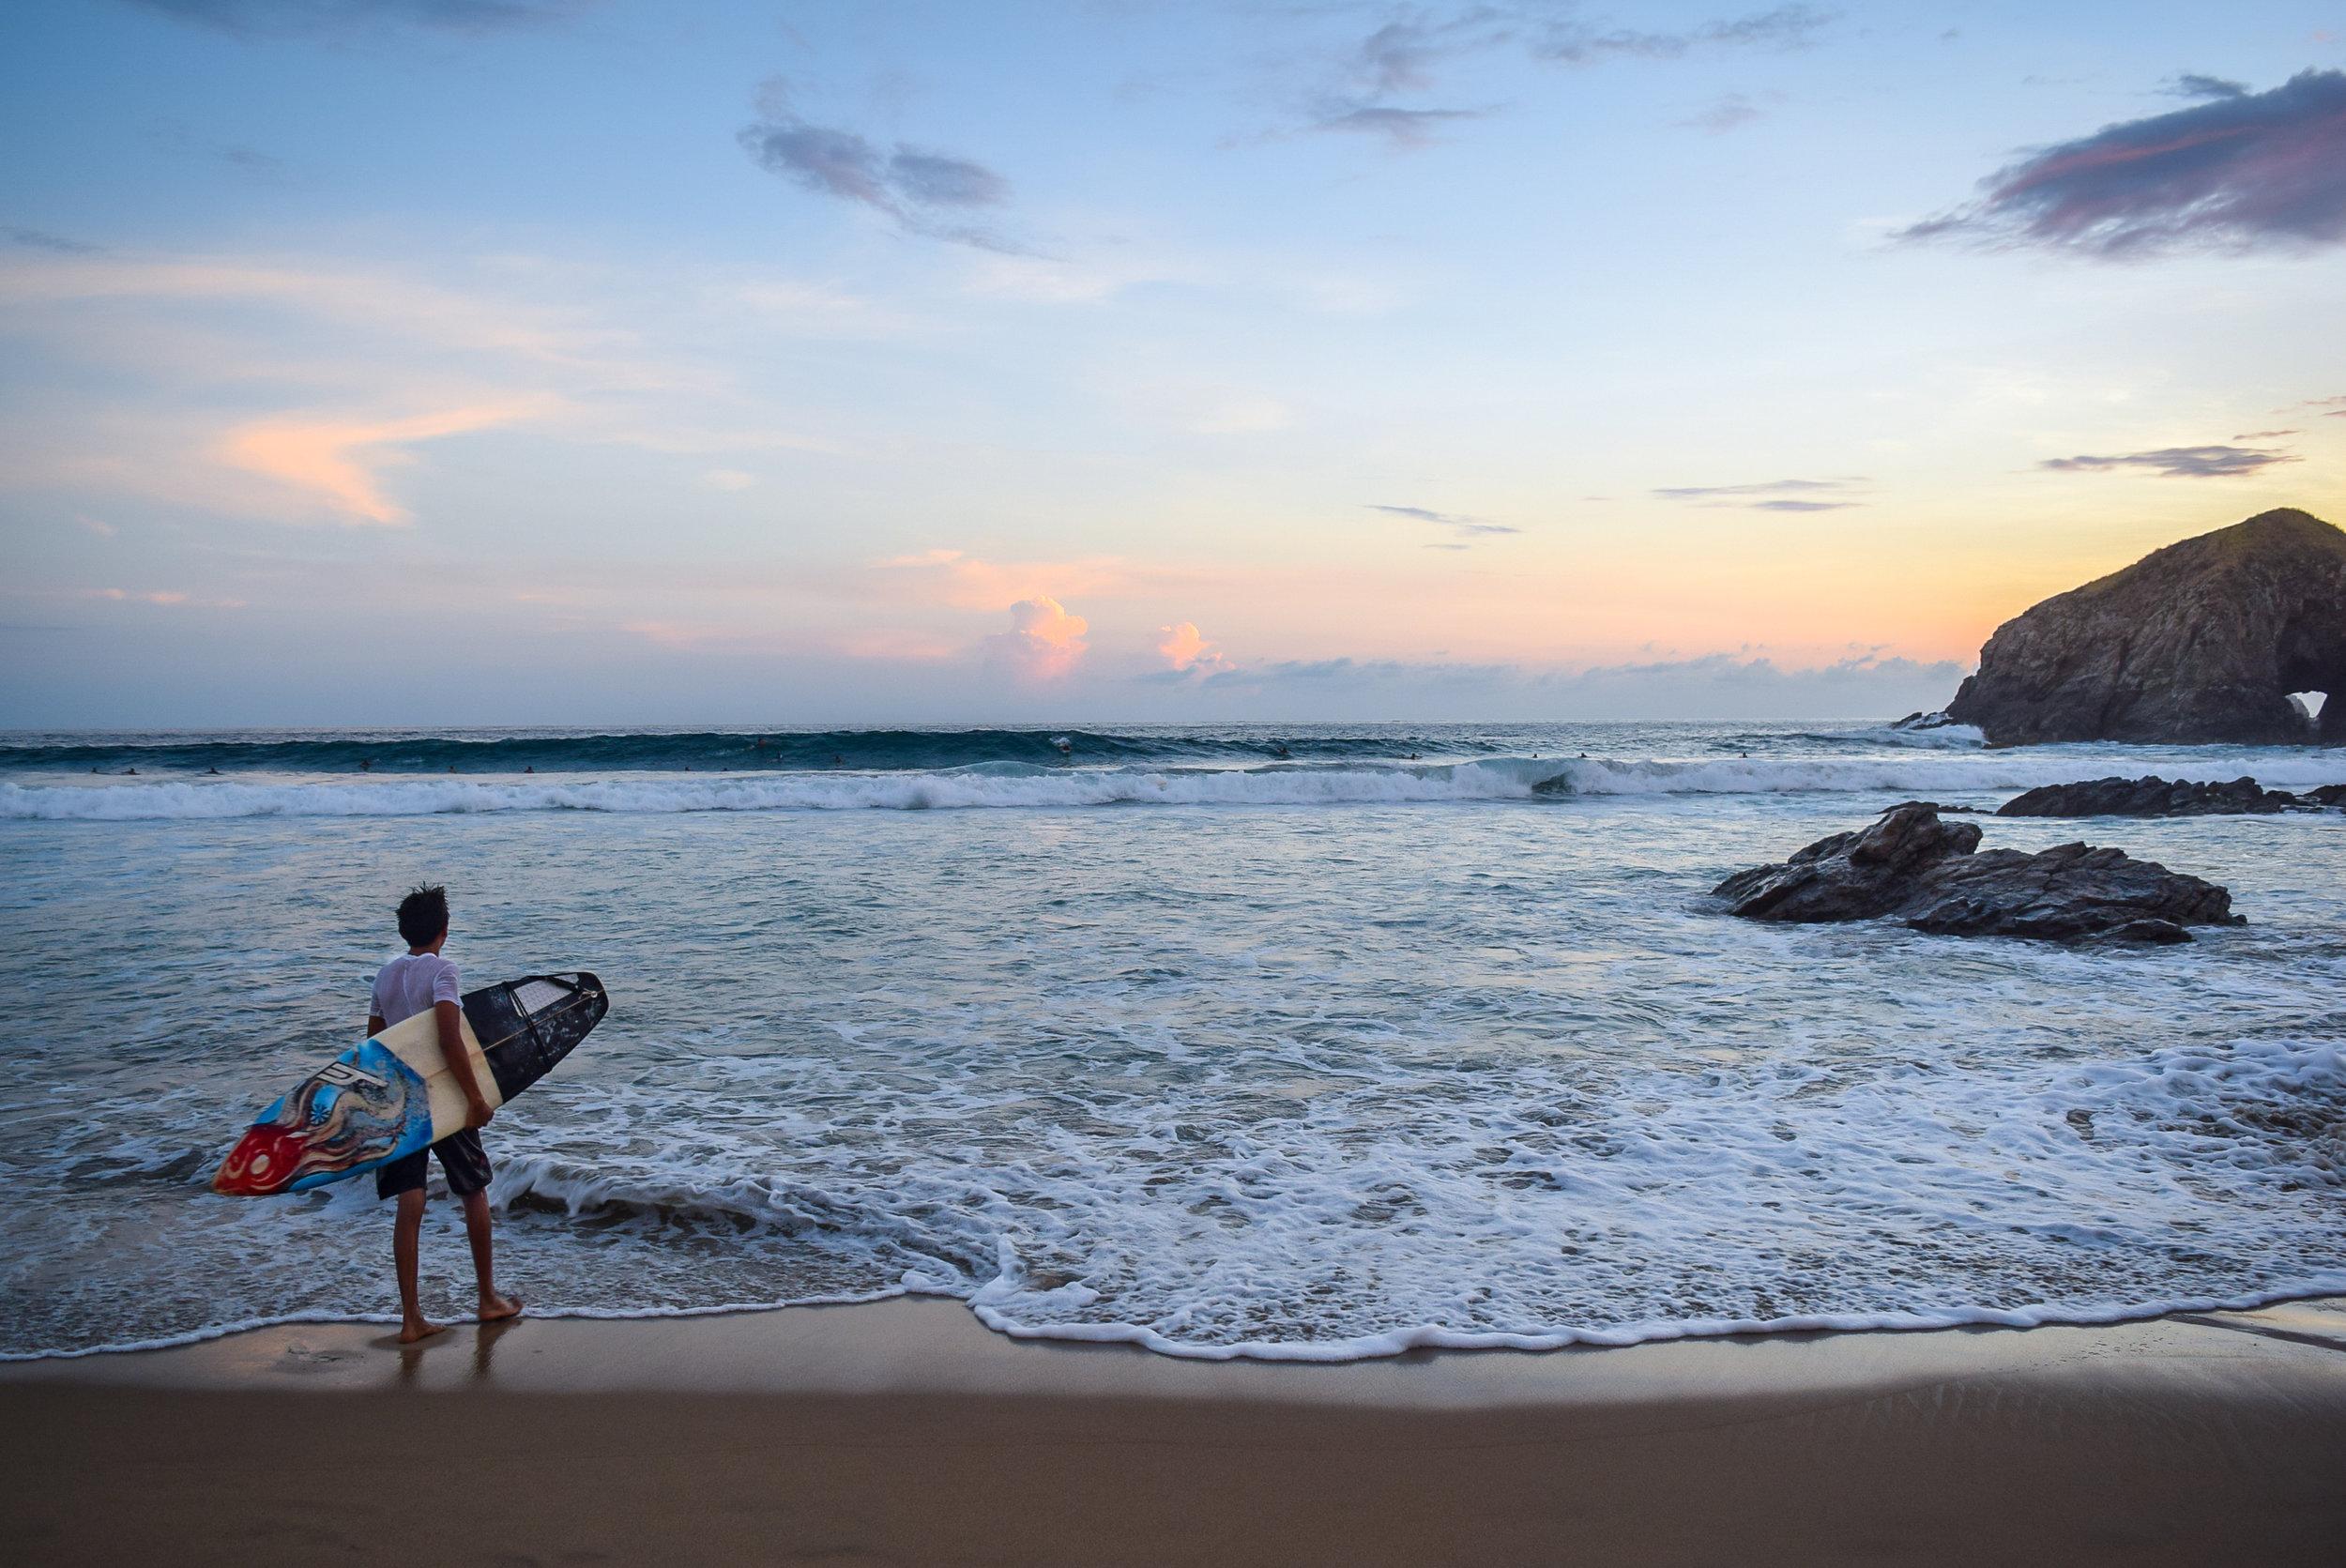 Surfer on the coast of Oaxaca